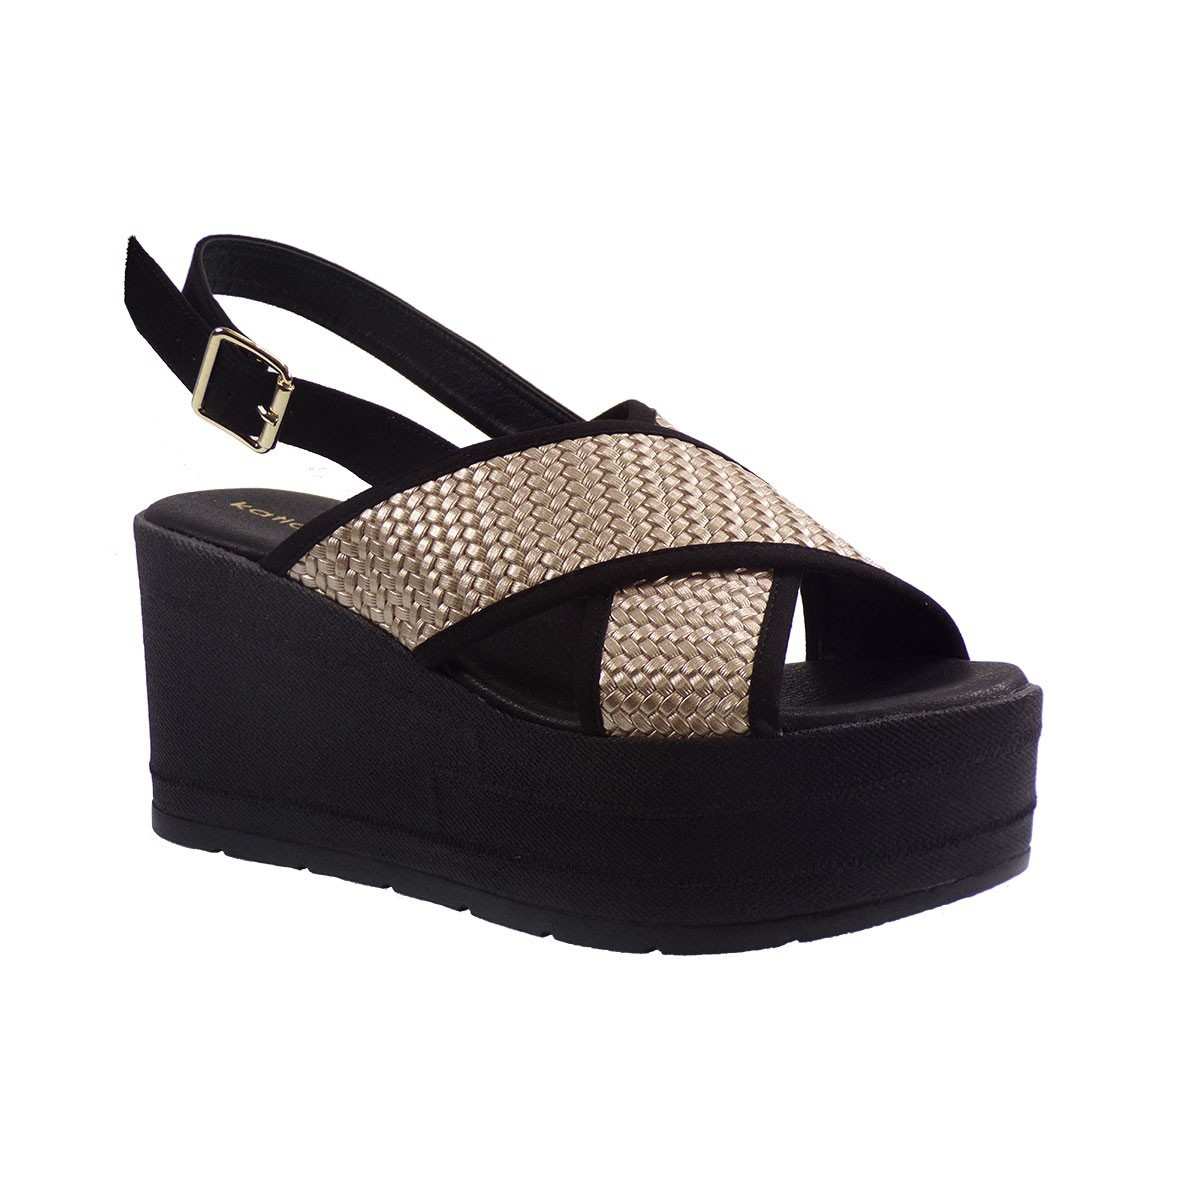 Katia Shoes Γυναικείες Πλατφόρμες Πέδιλα 137 Πλατίνα